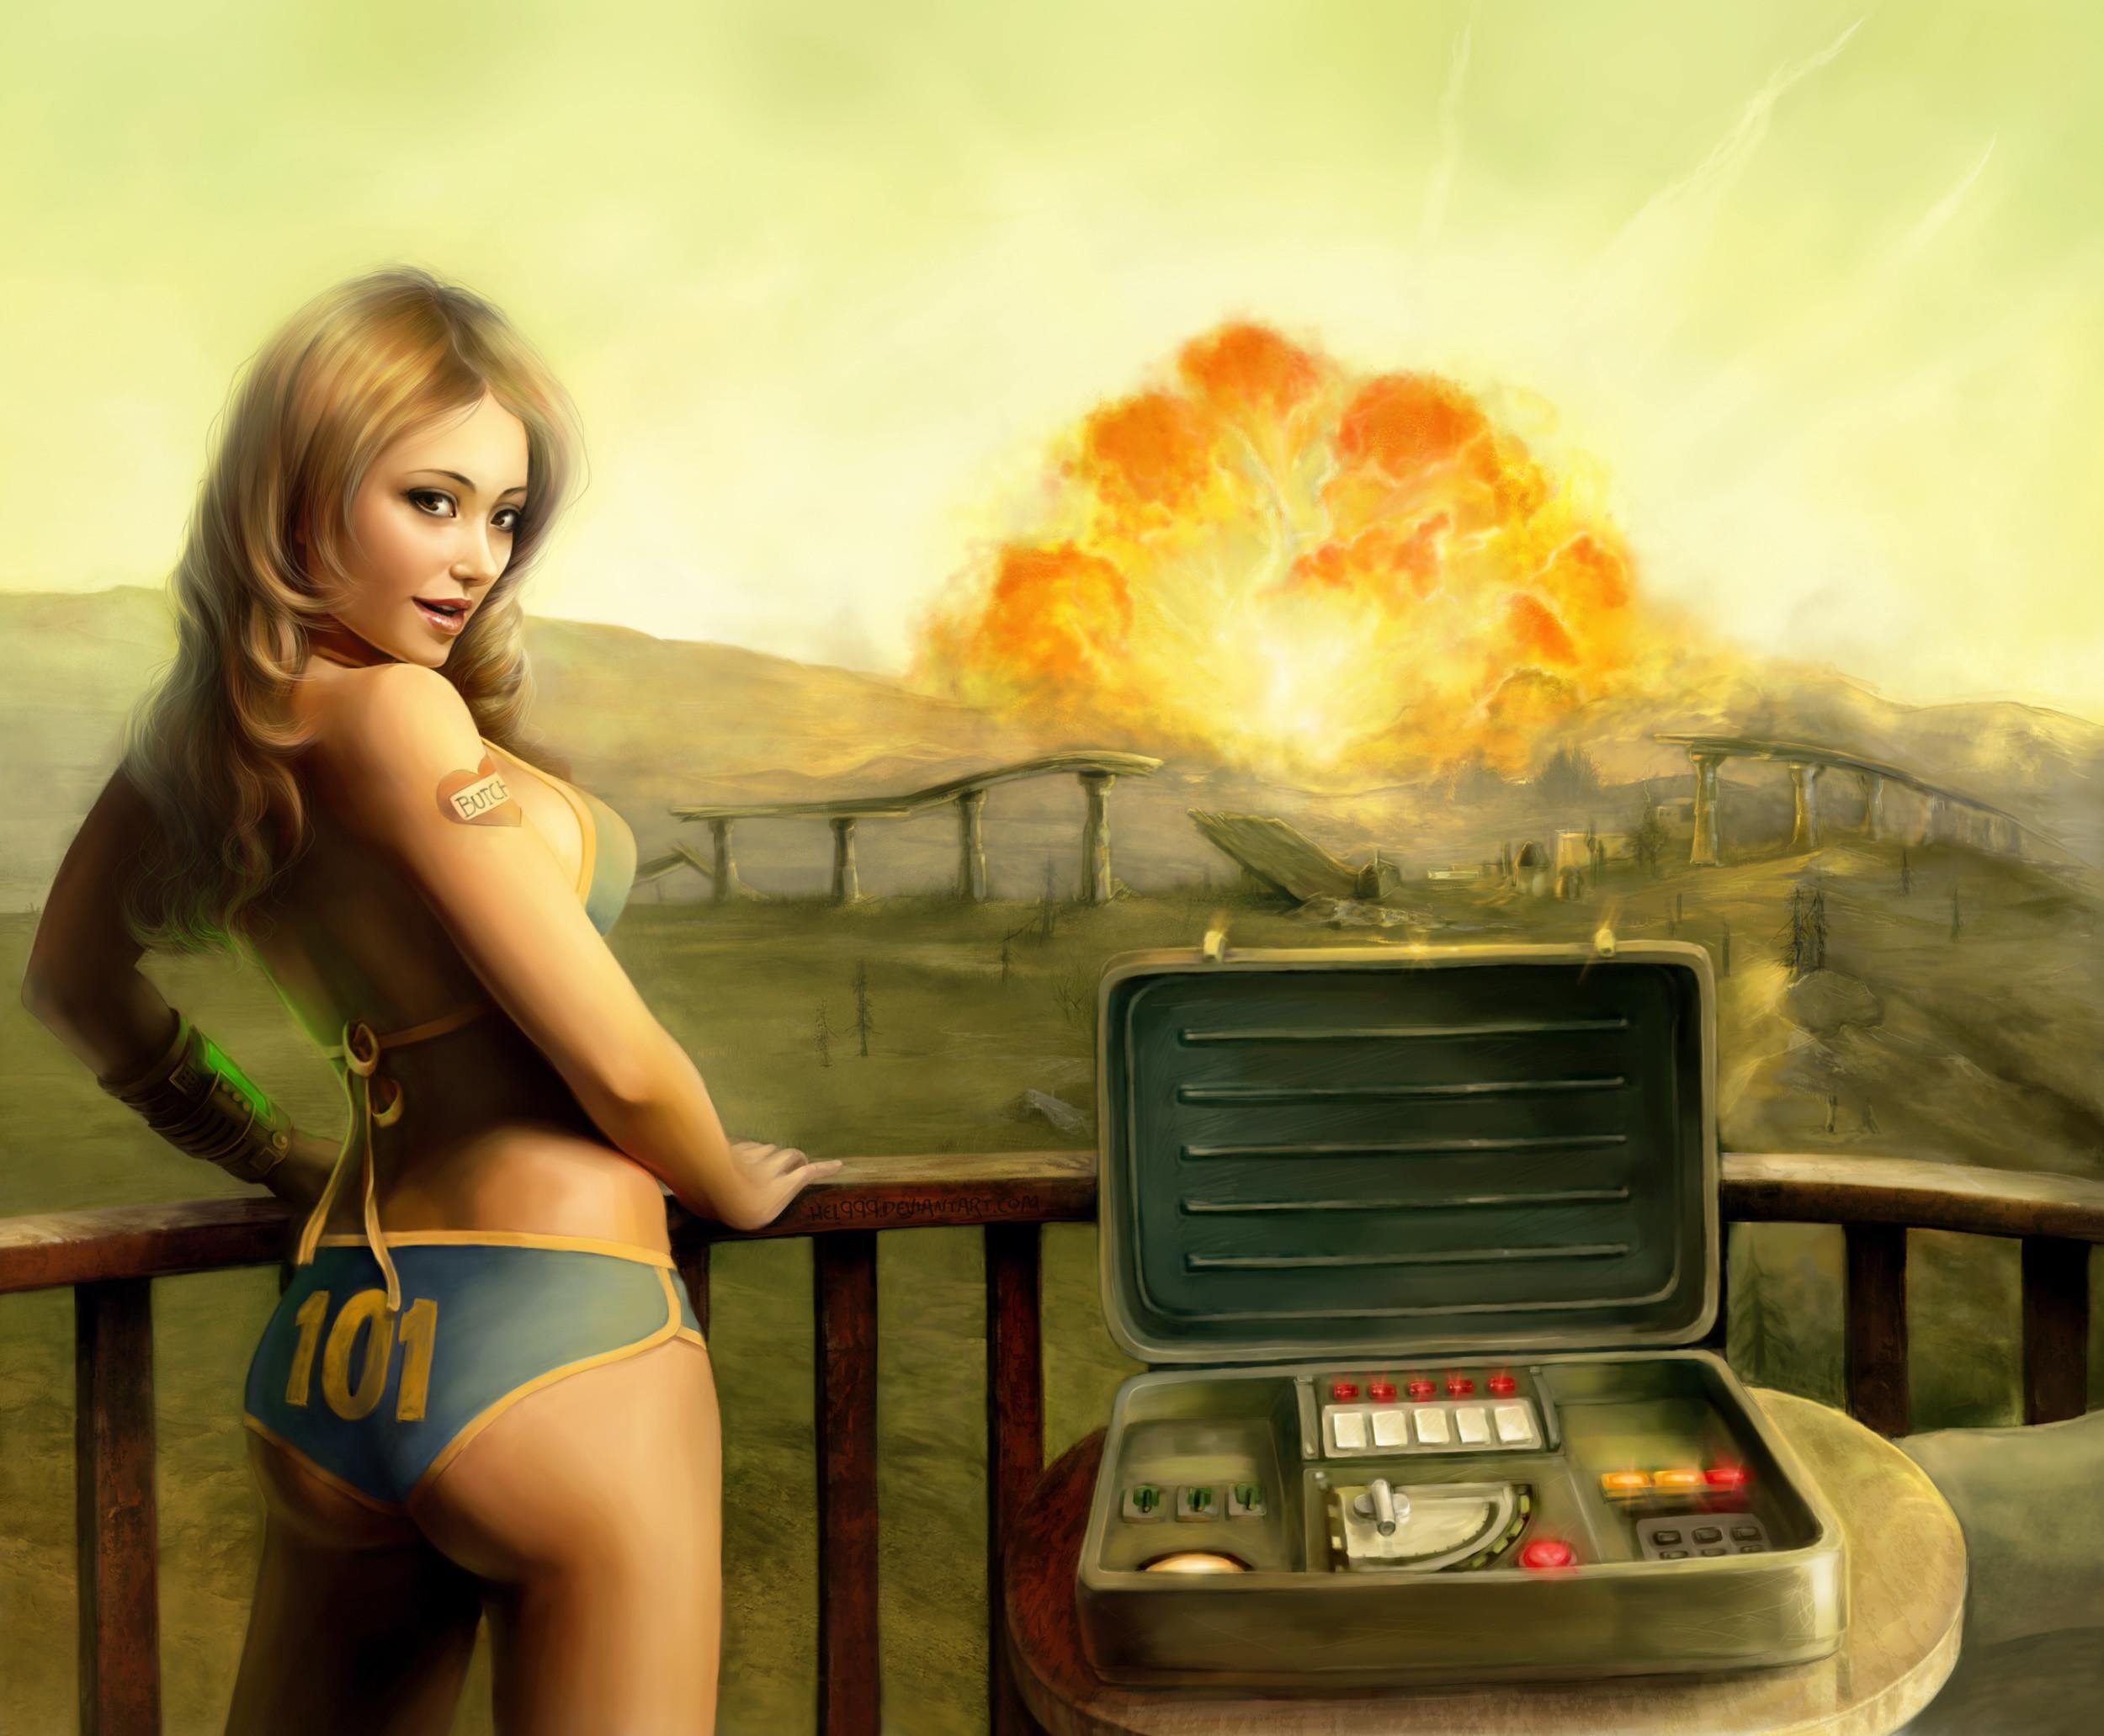 Fallout 3 sexy wallpaper